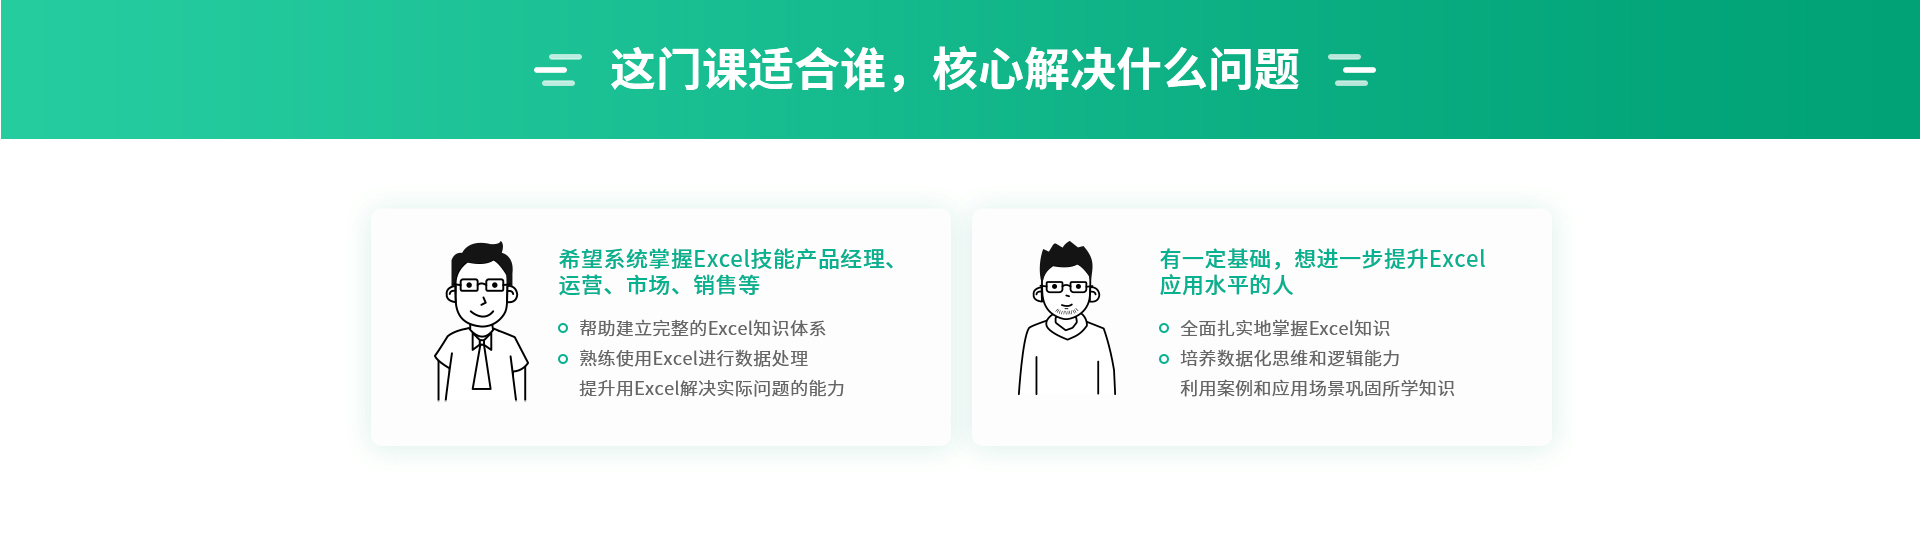 excel-PC_02.jpg